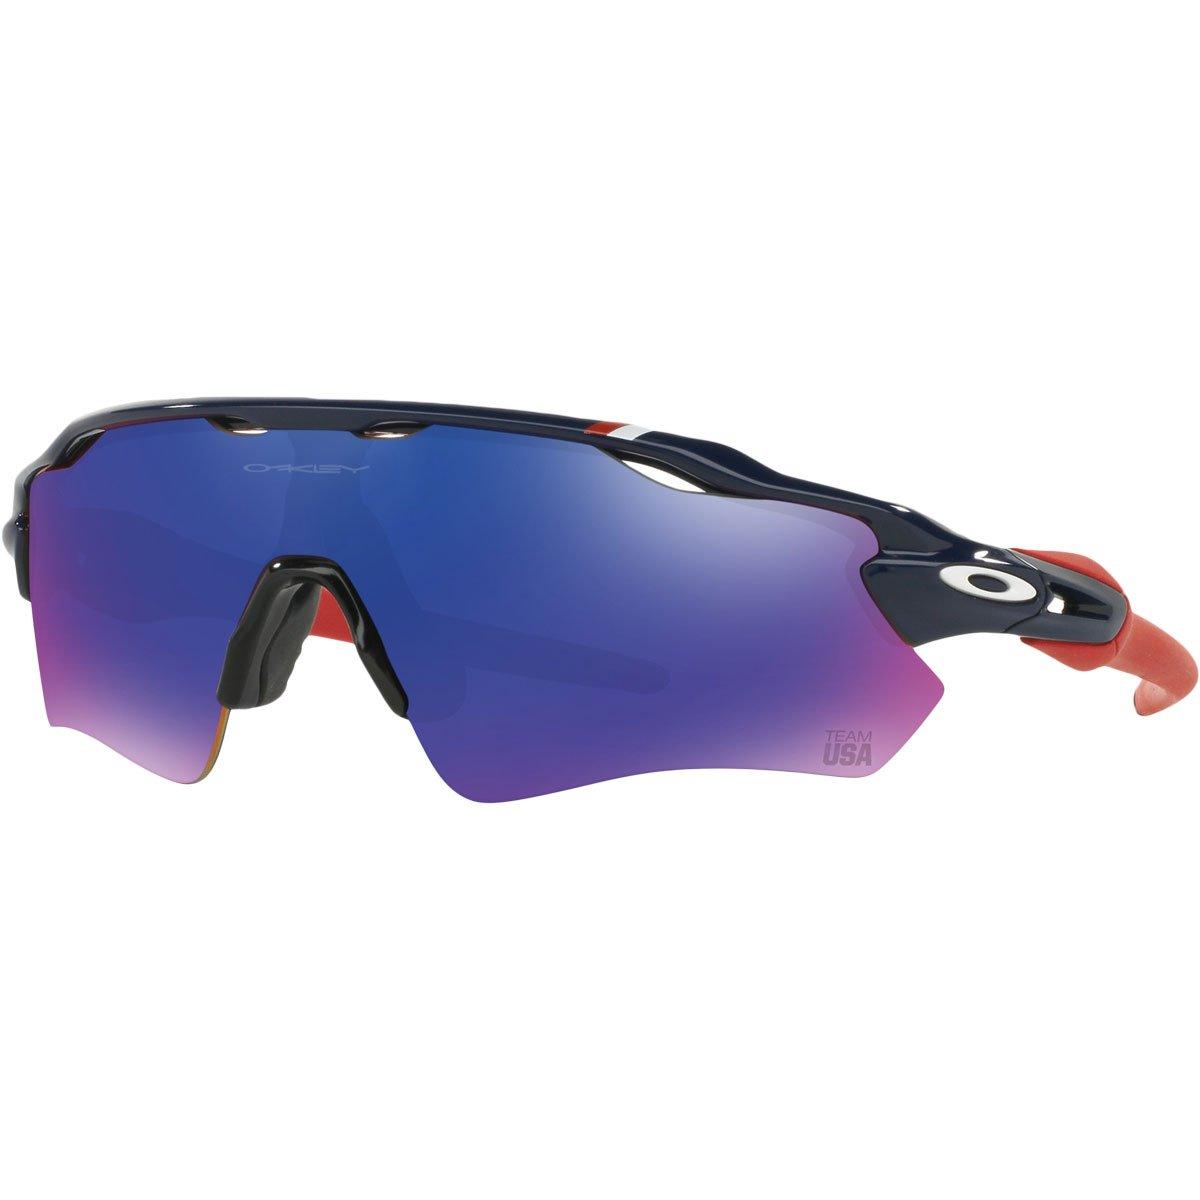 Oakley Men's Radar EV Path OO9208-14 Non-Polarized Iridium Shield Sunglasses, Dark Blue, 138 mm